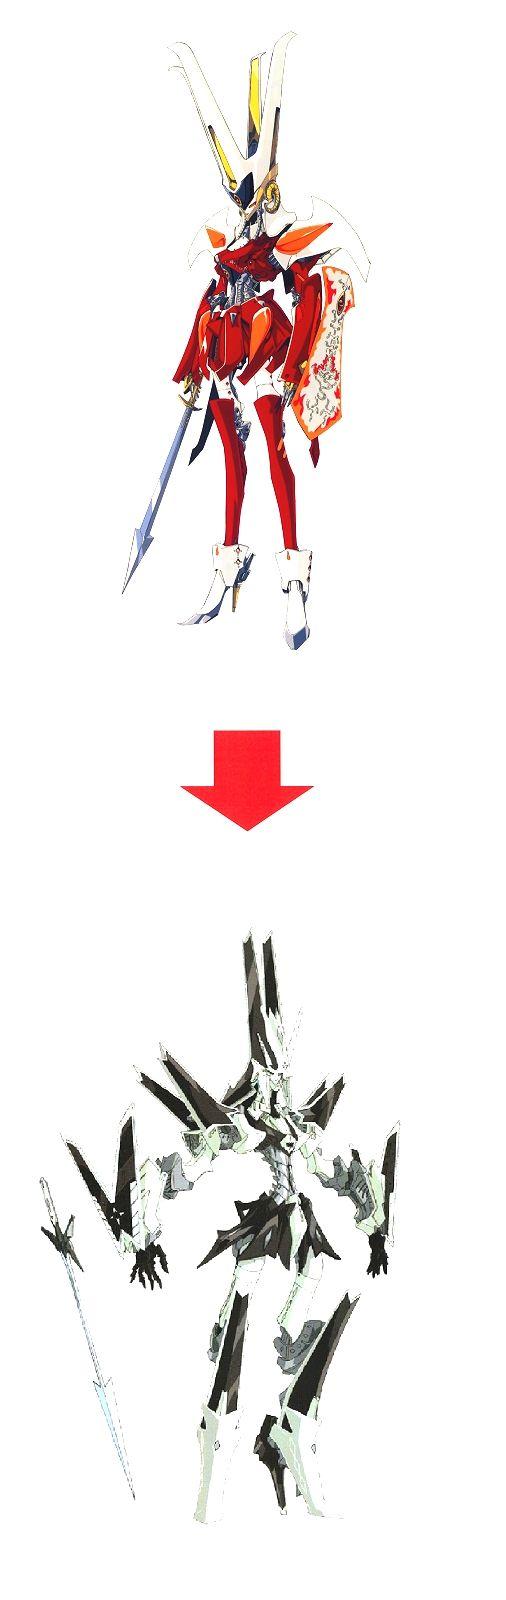 F.S.S Mamoru Nagano mechanic design. MotorHead to GoThicMade Setting change of Story! the EMPRESS of DISTURB → Die KAISERIN